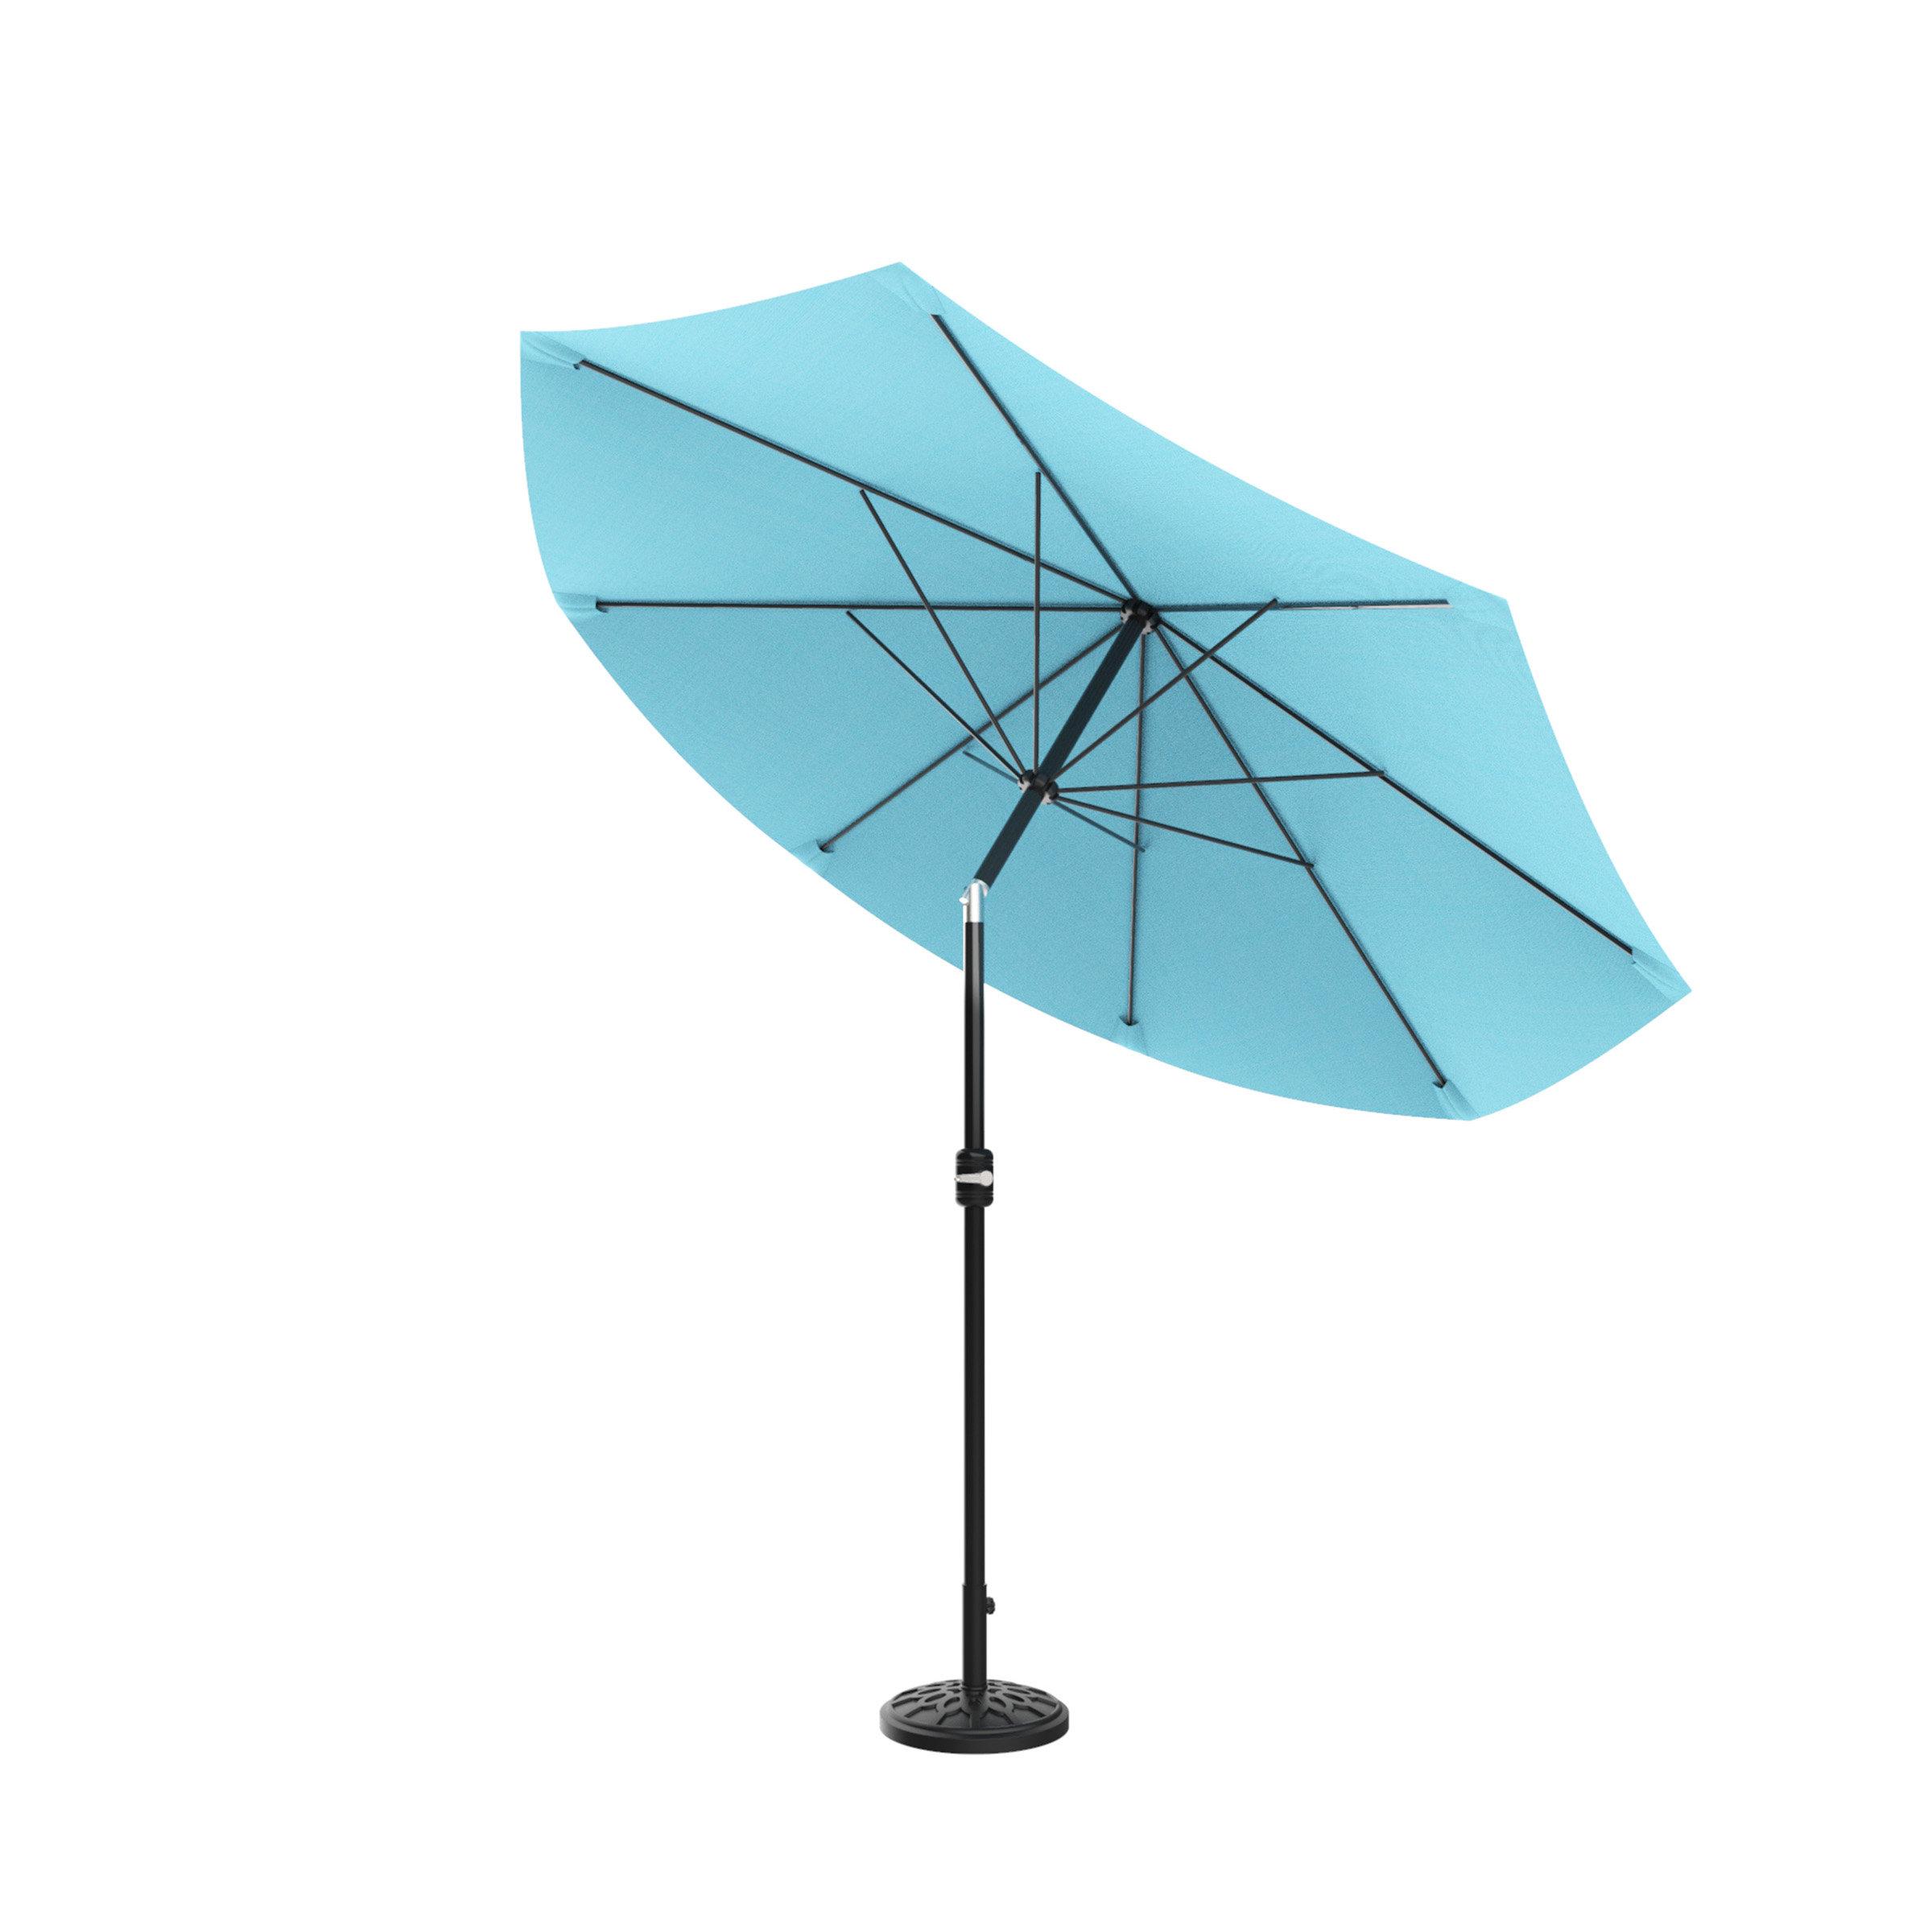 Kelton 10' Market Umbrella For Most Popular Cardine Market Umbrellas (View 6 of 20)